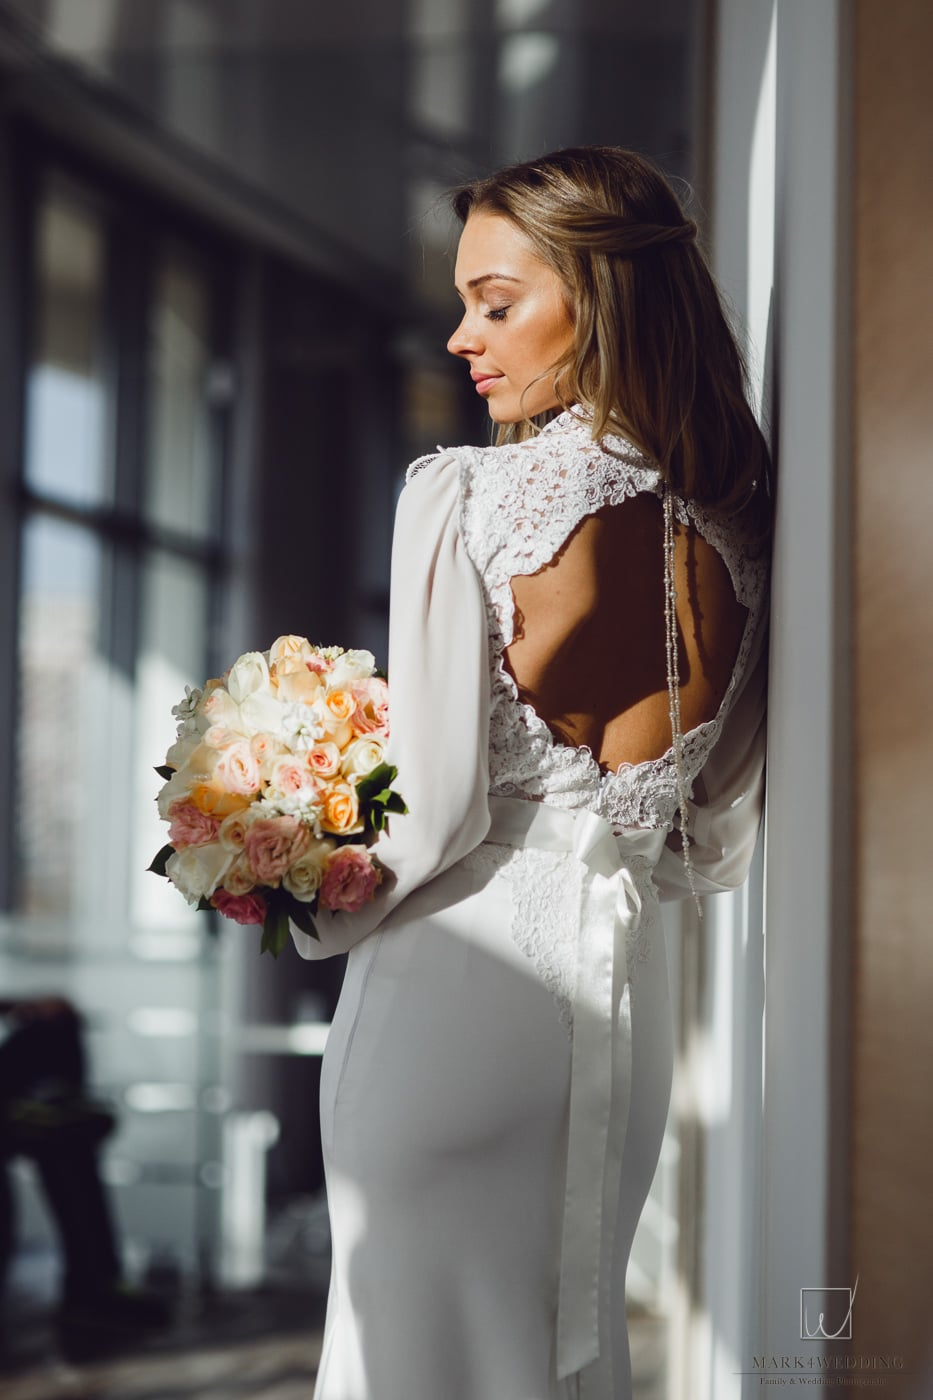 Galina & Assaf wedding_94.jpg